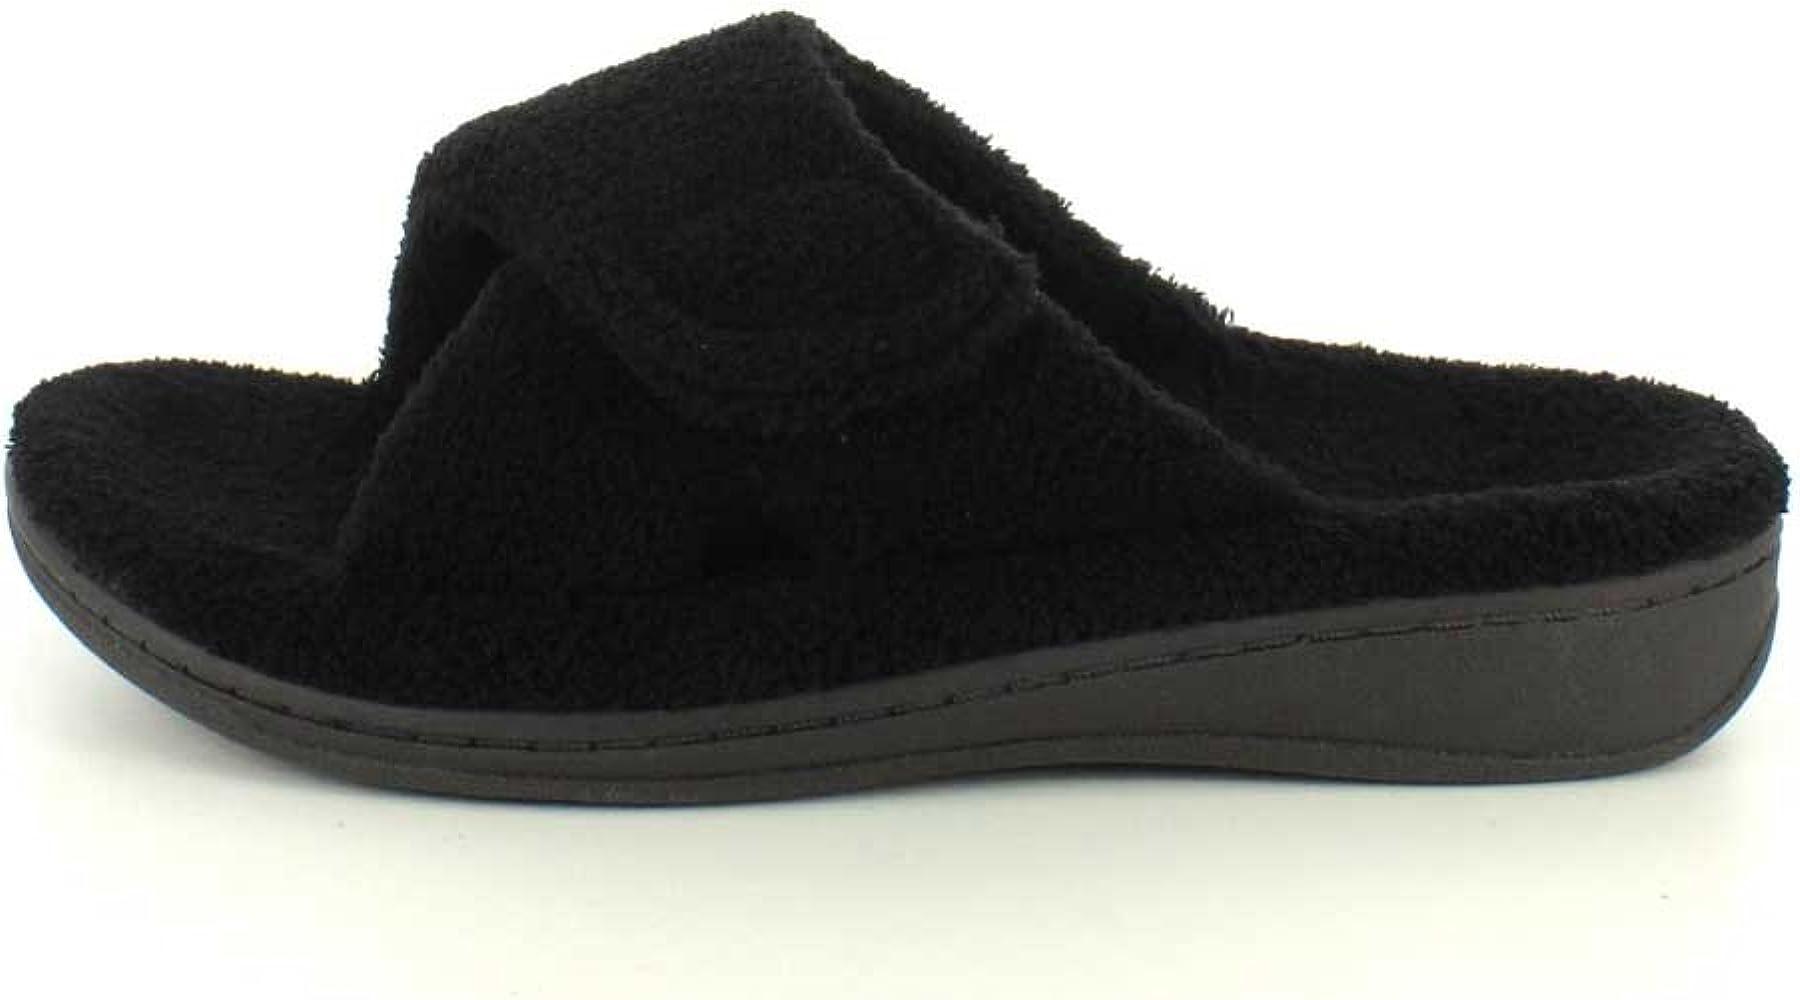 orthotic slippers ladies